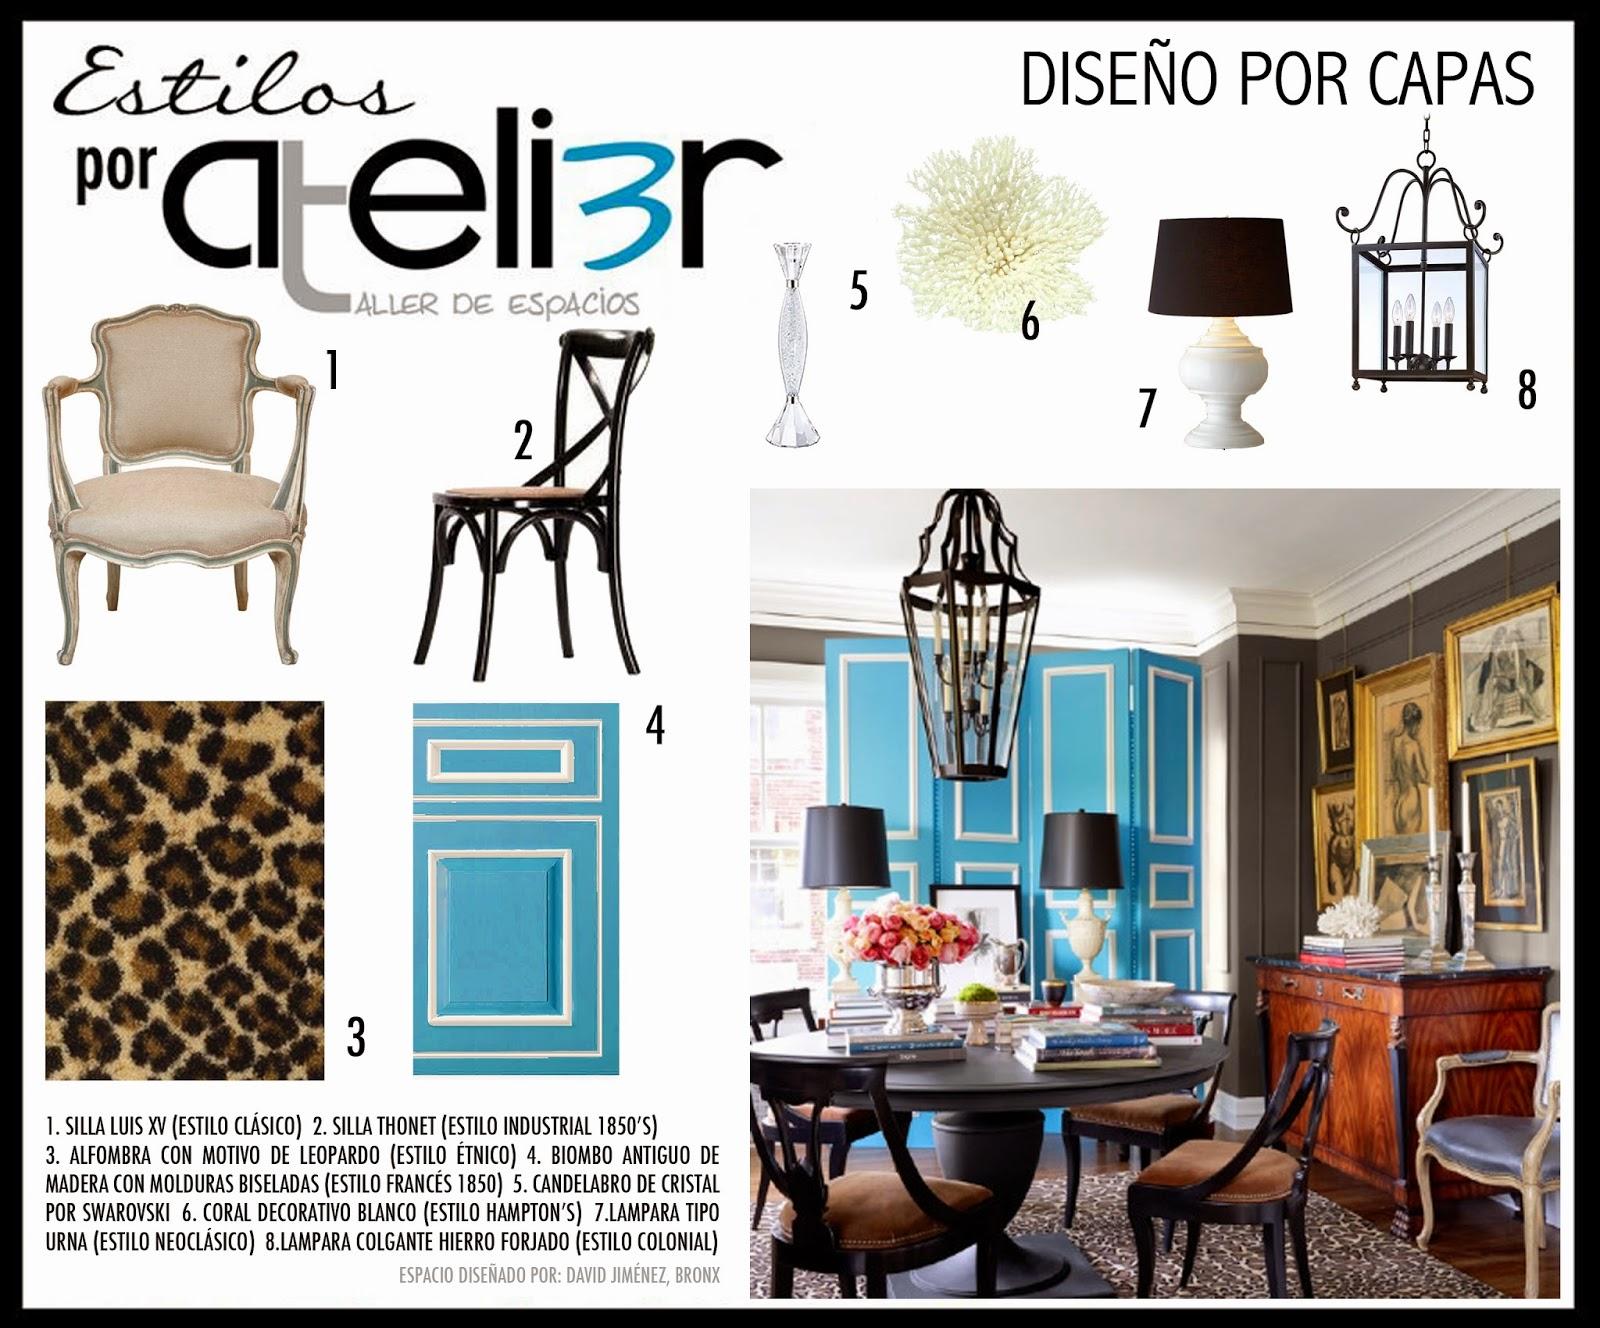 Diseño de interiores, Interior design Guatemala, eclectic layerism